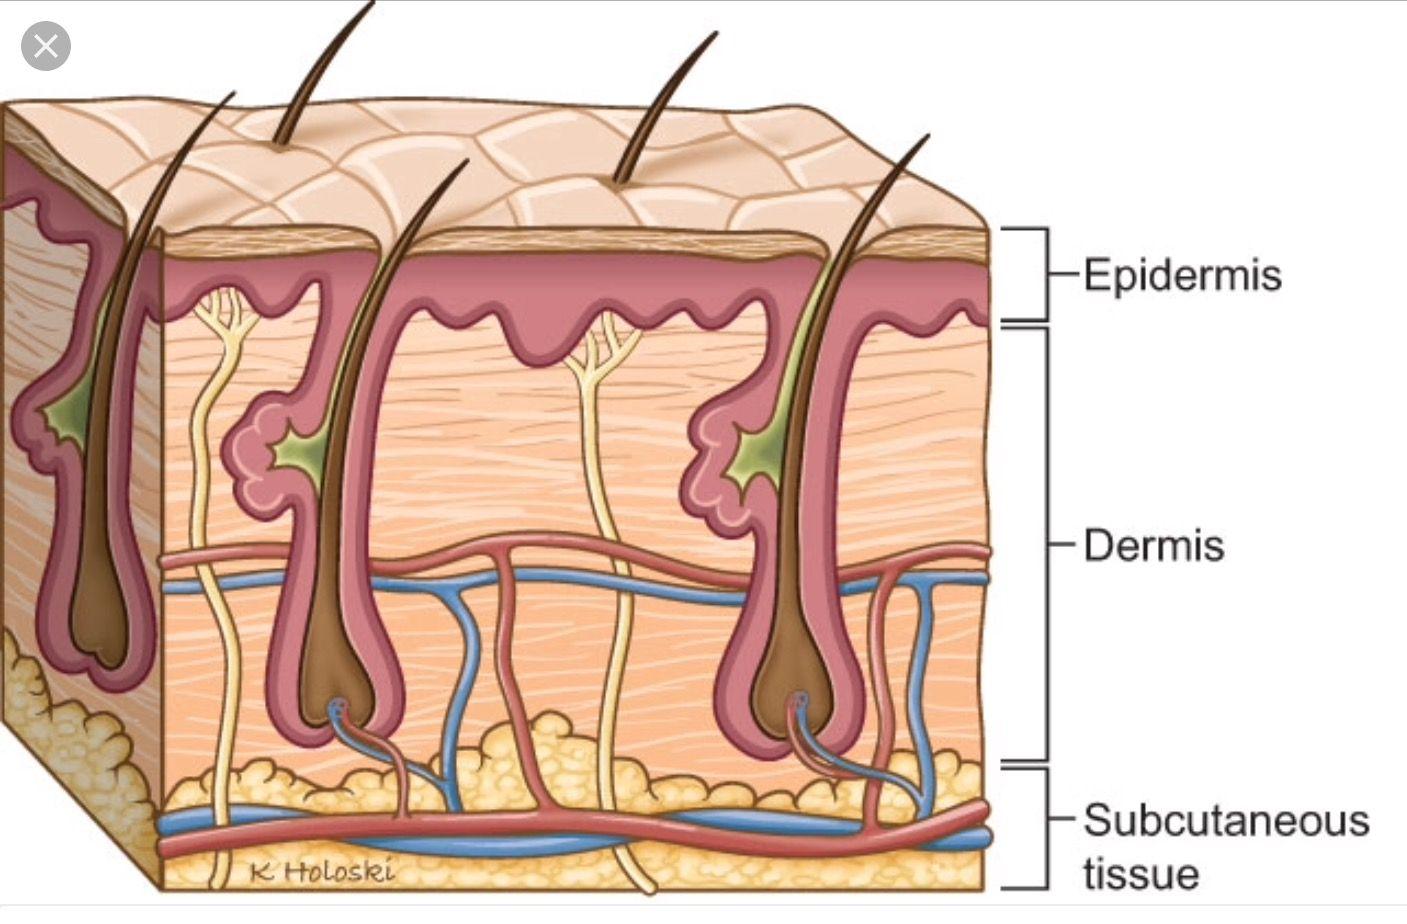 subcutaneous tissue bombshell hair head and neck hair studio body works  [ 1407 x 924 Pixel ]